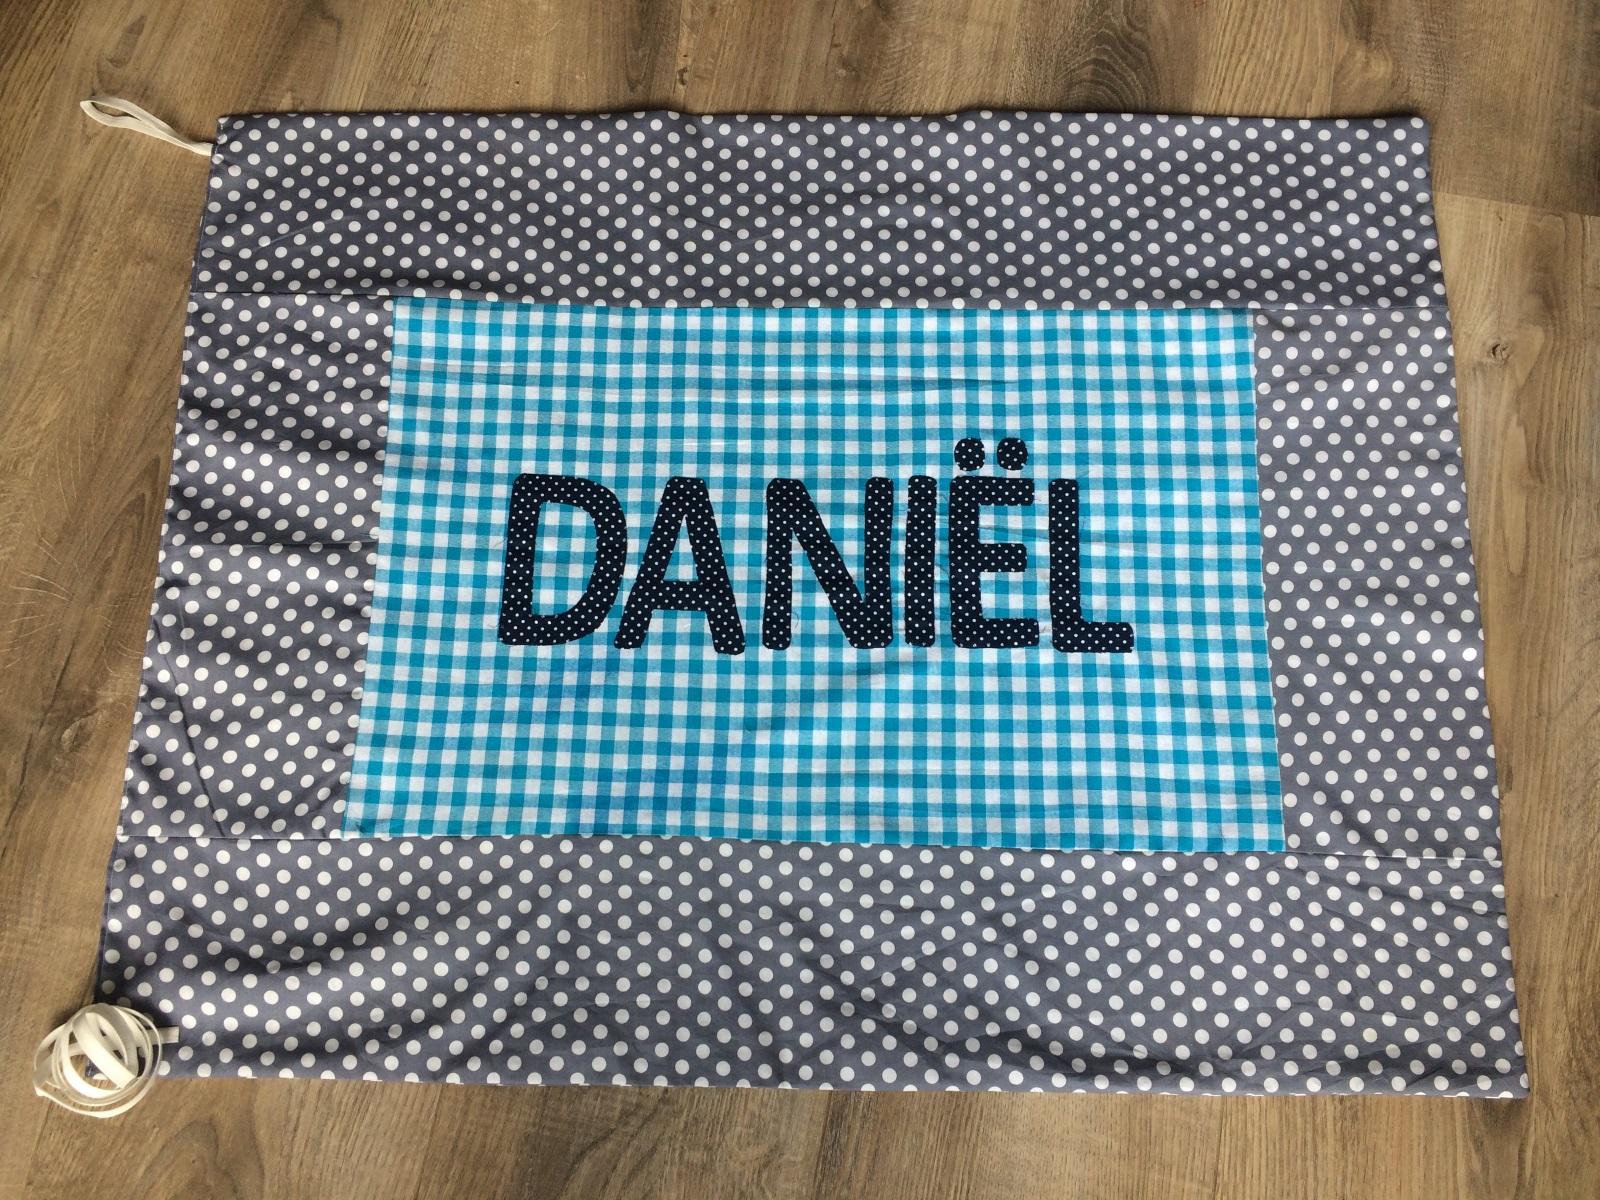 Geboortevlag Daniël